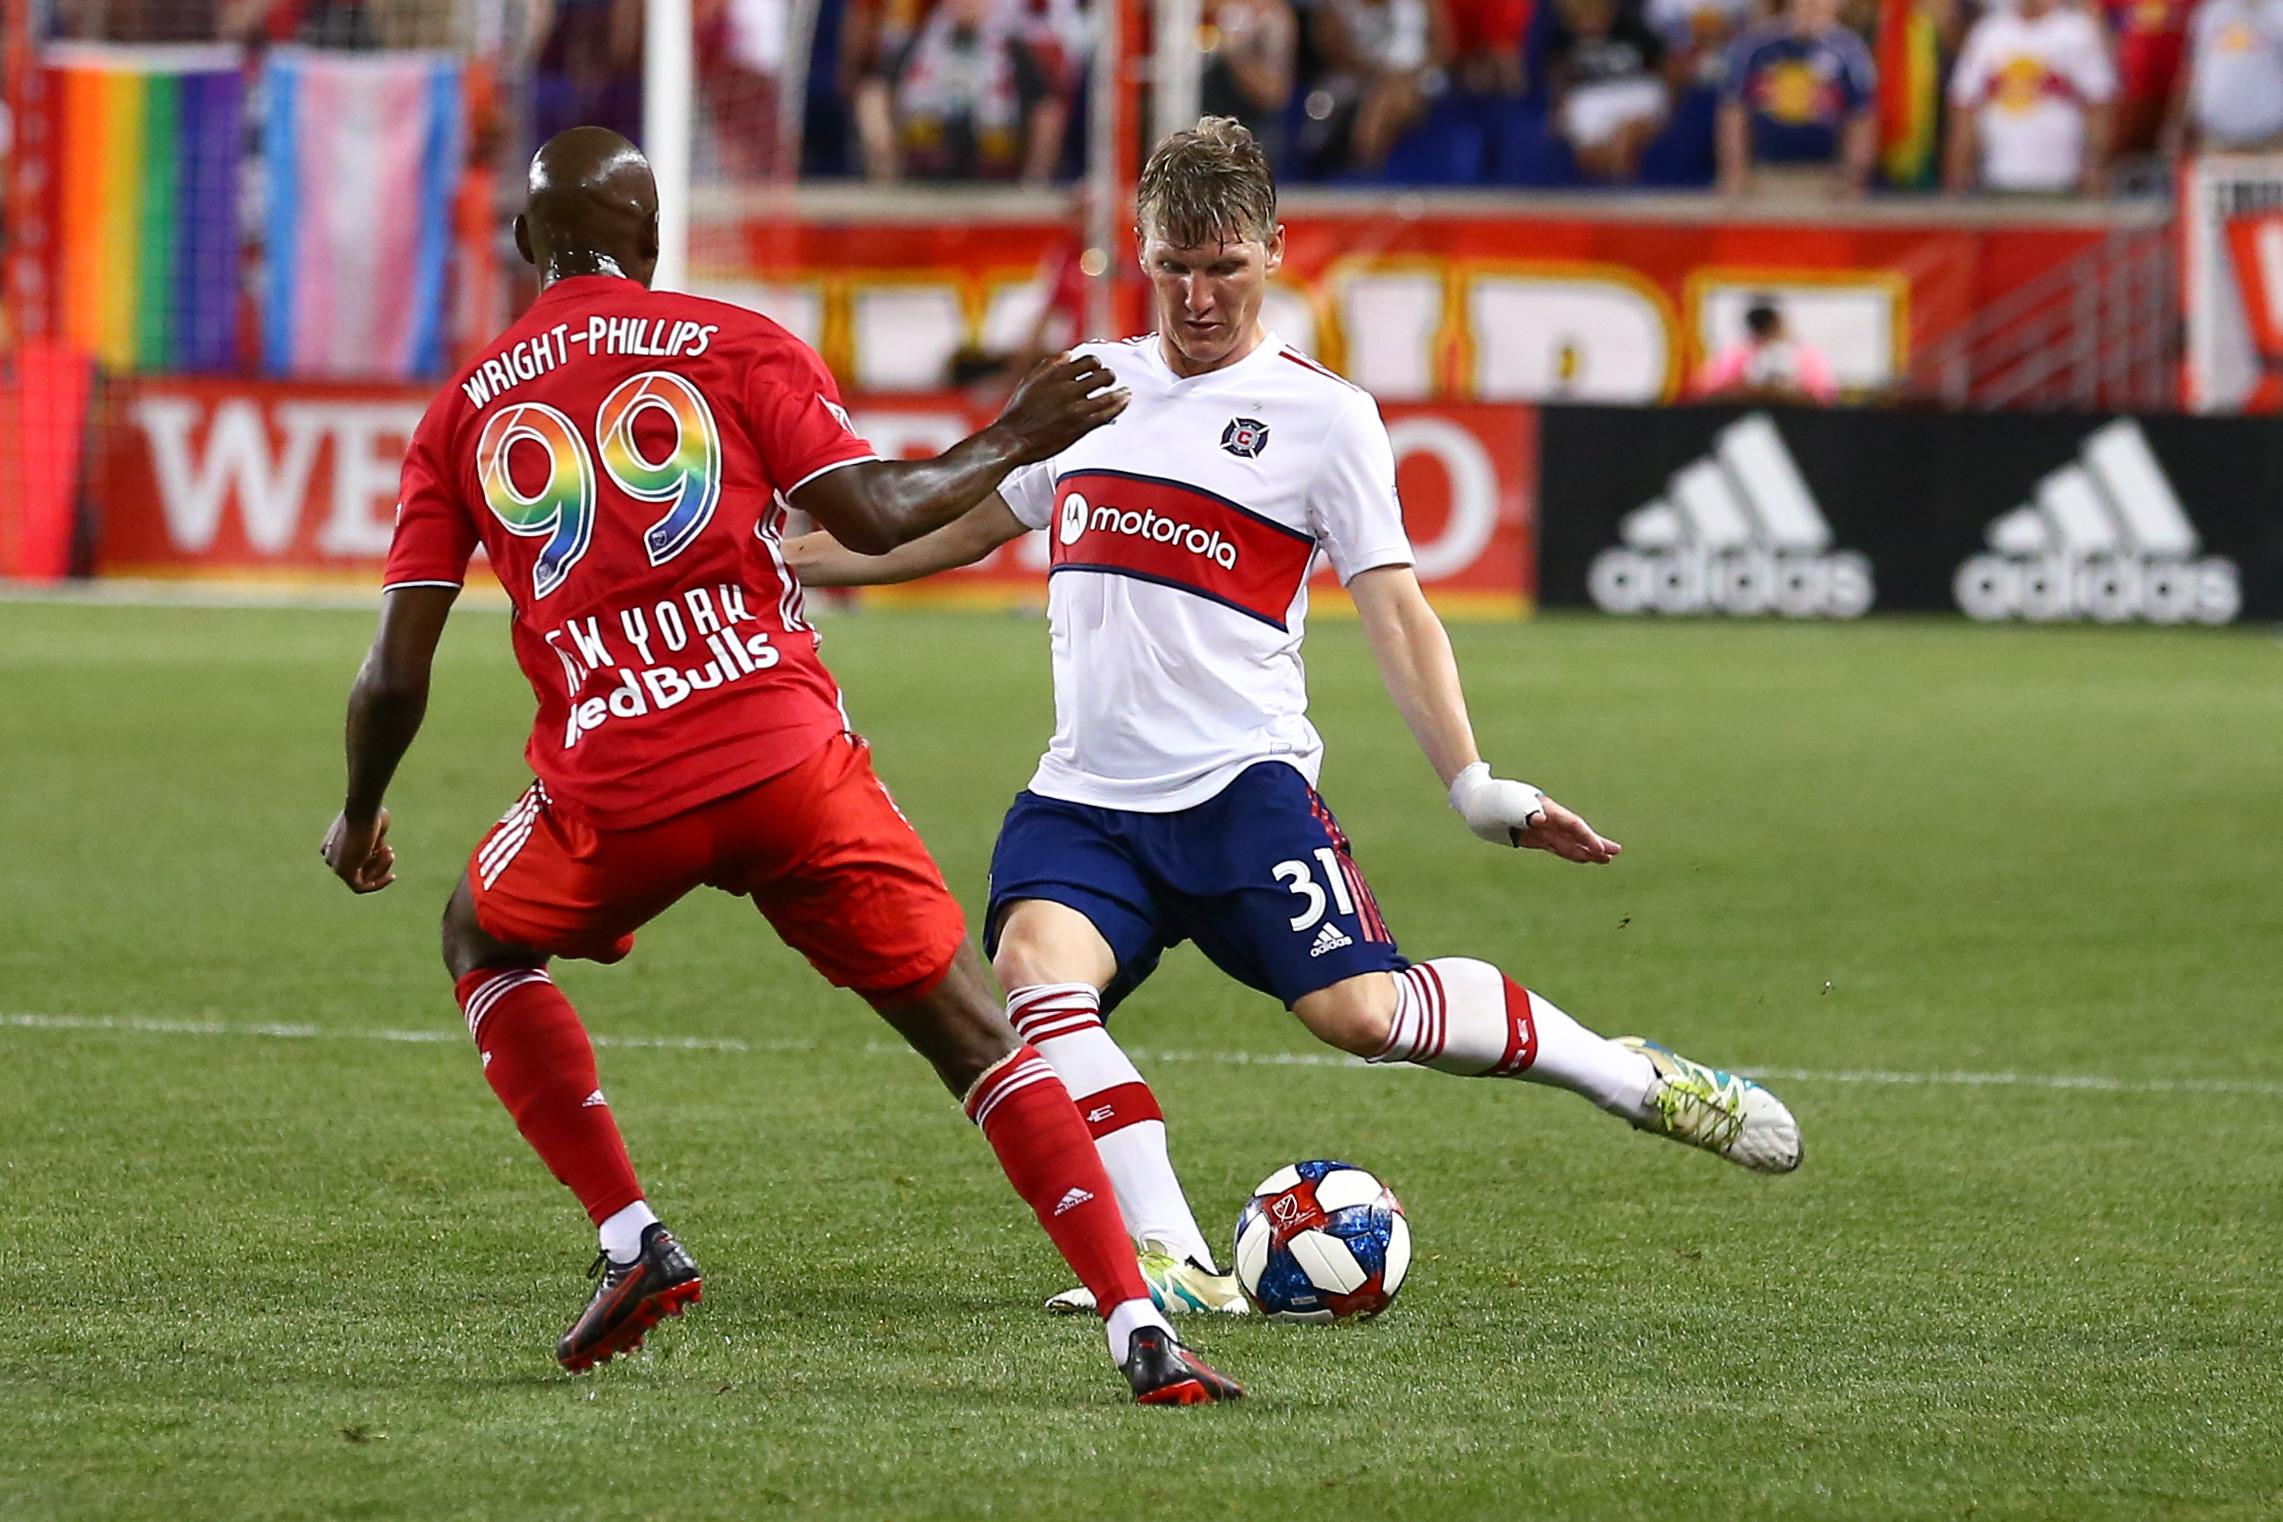 SOCCER: JUN 28 MLS - Chicago Fire at New York Red Bulls